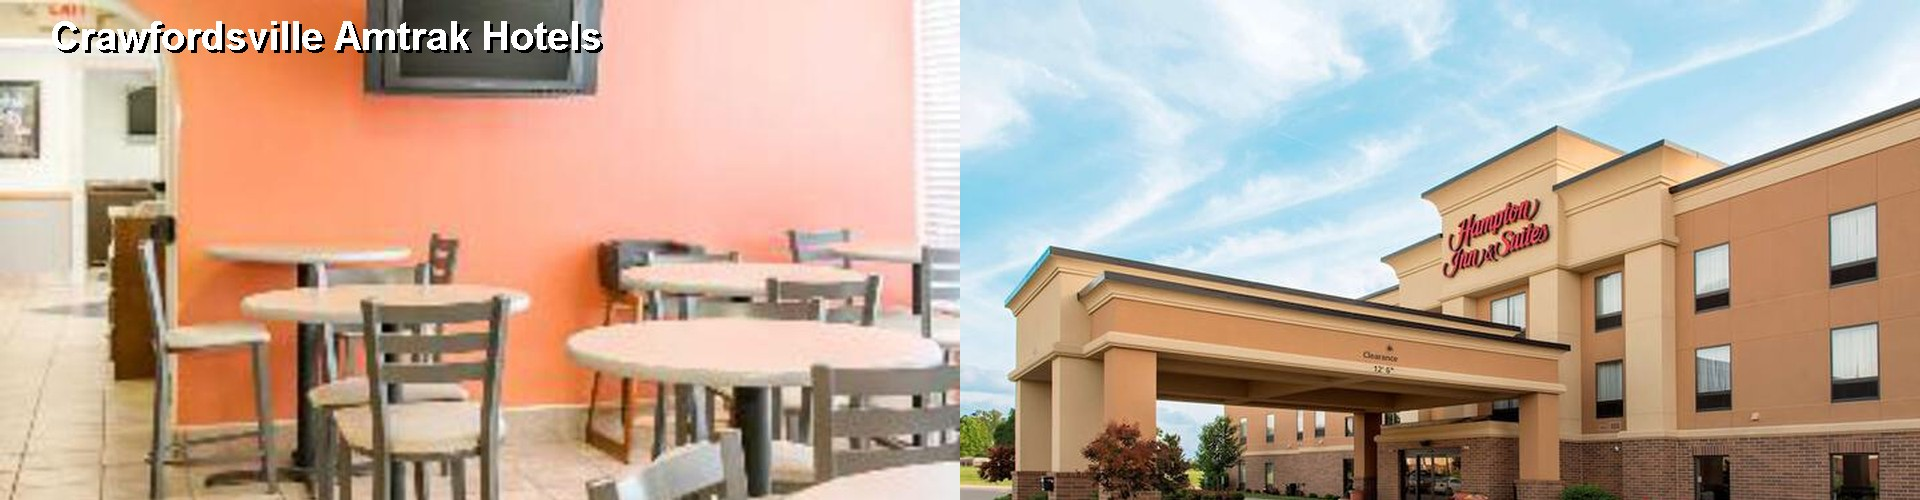 4 Best Hotels Near Crawfordsville Amtrak